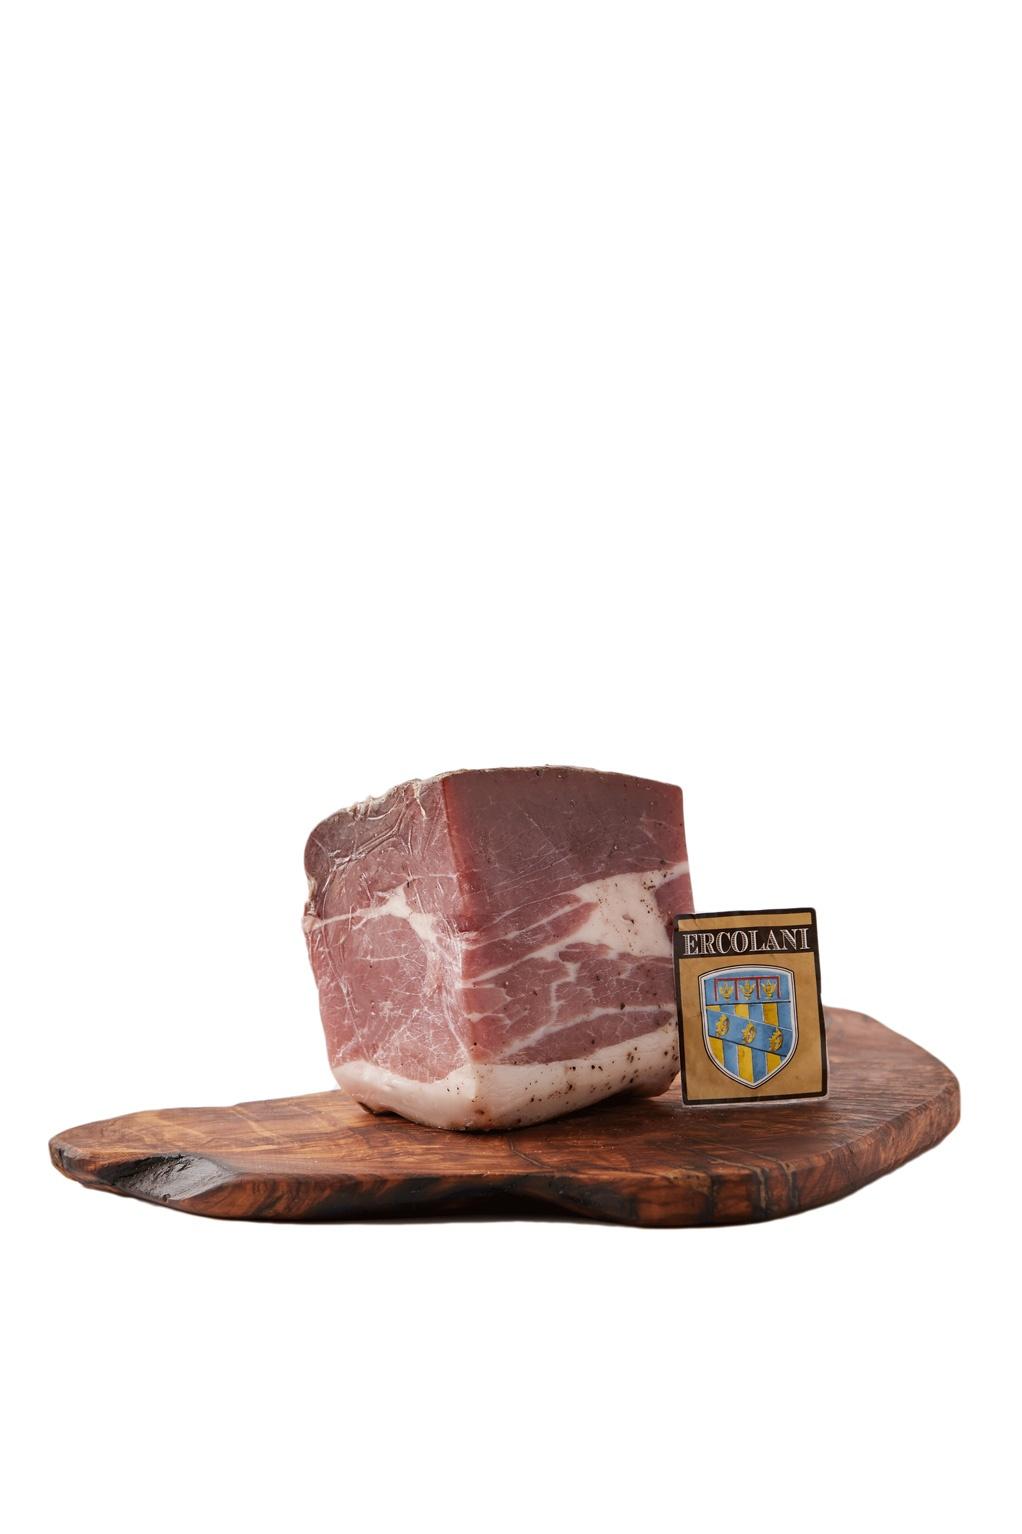 Ercolani daging babi babi